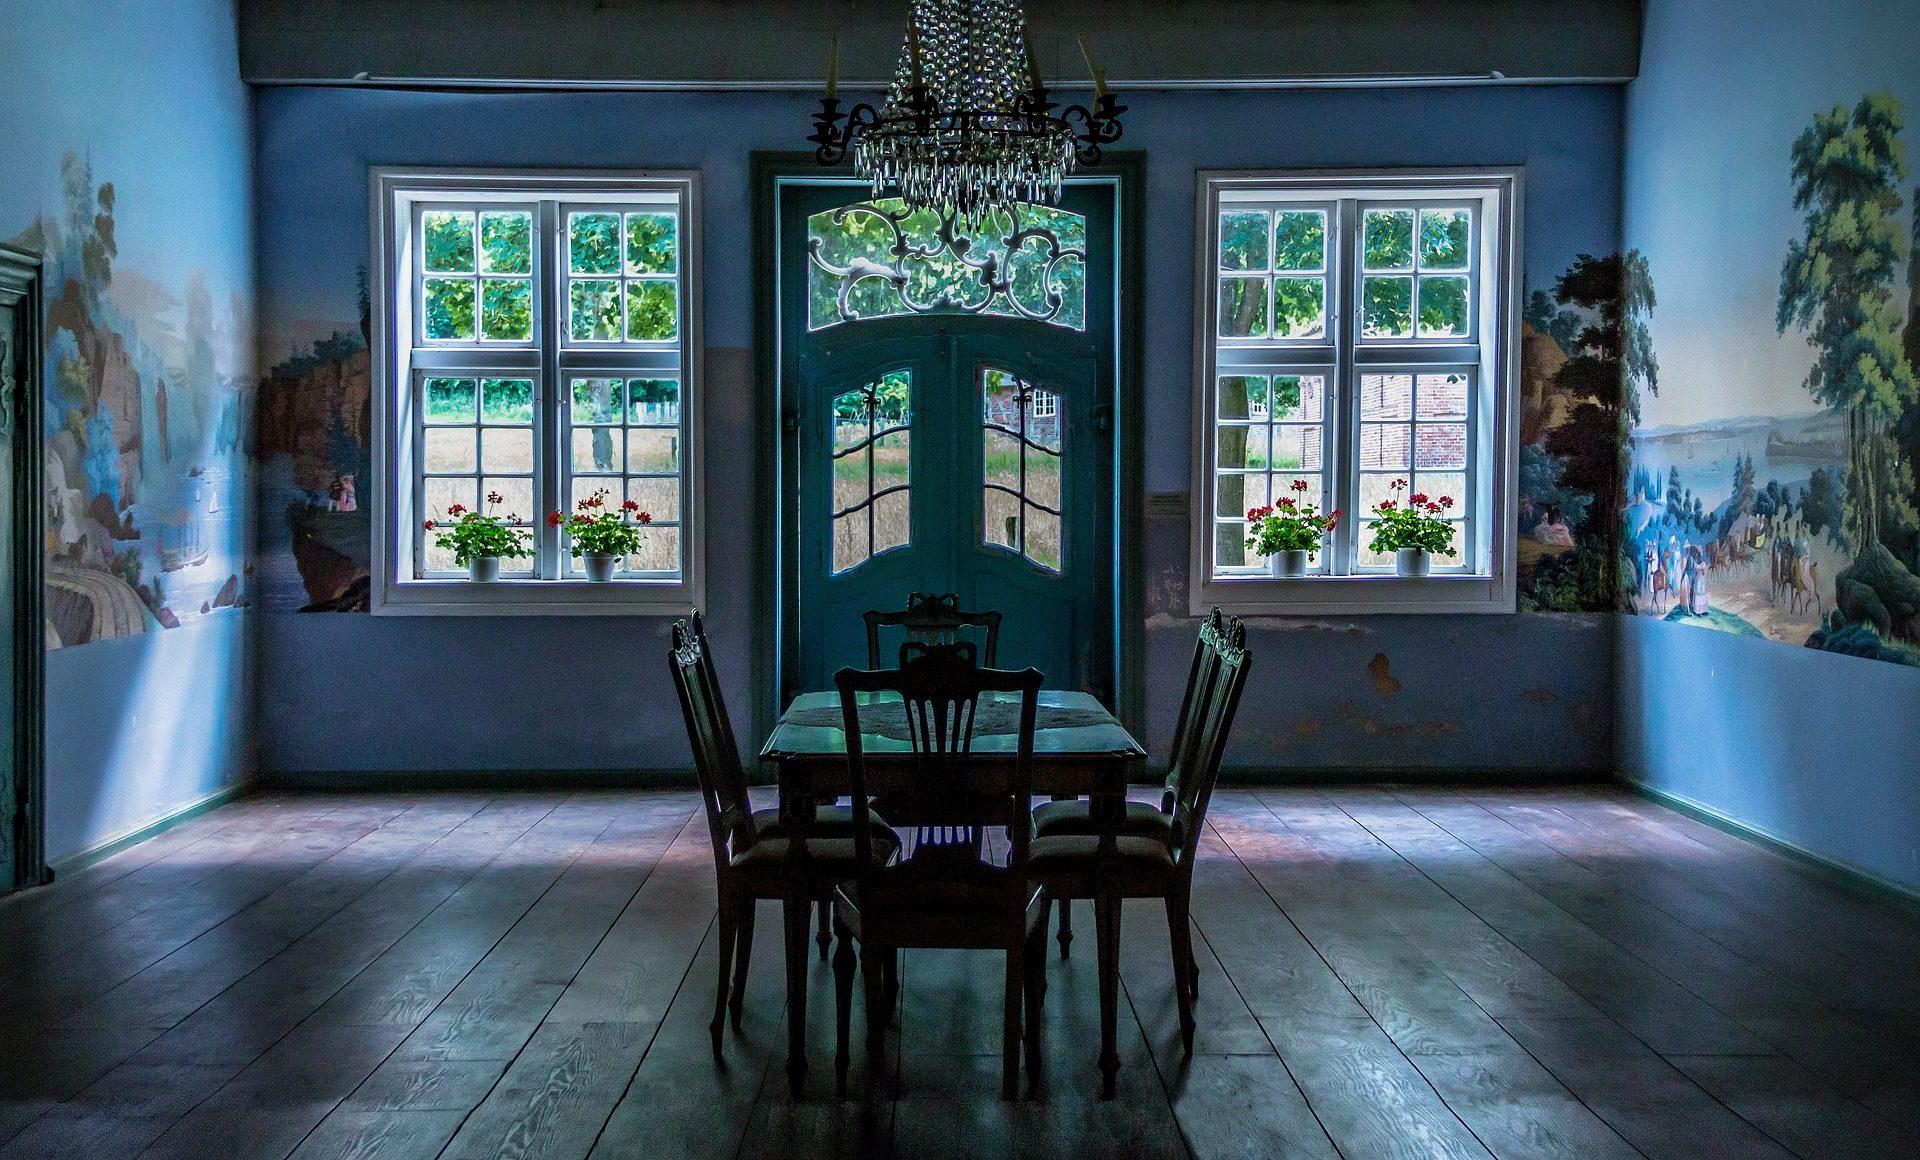 Zimmer, alt, Esszimmer, Tabelle, Stühle, Jahrgang - Wallpaper HD - Prof.-falken.com